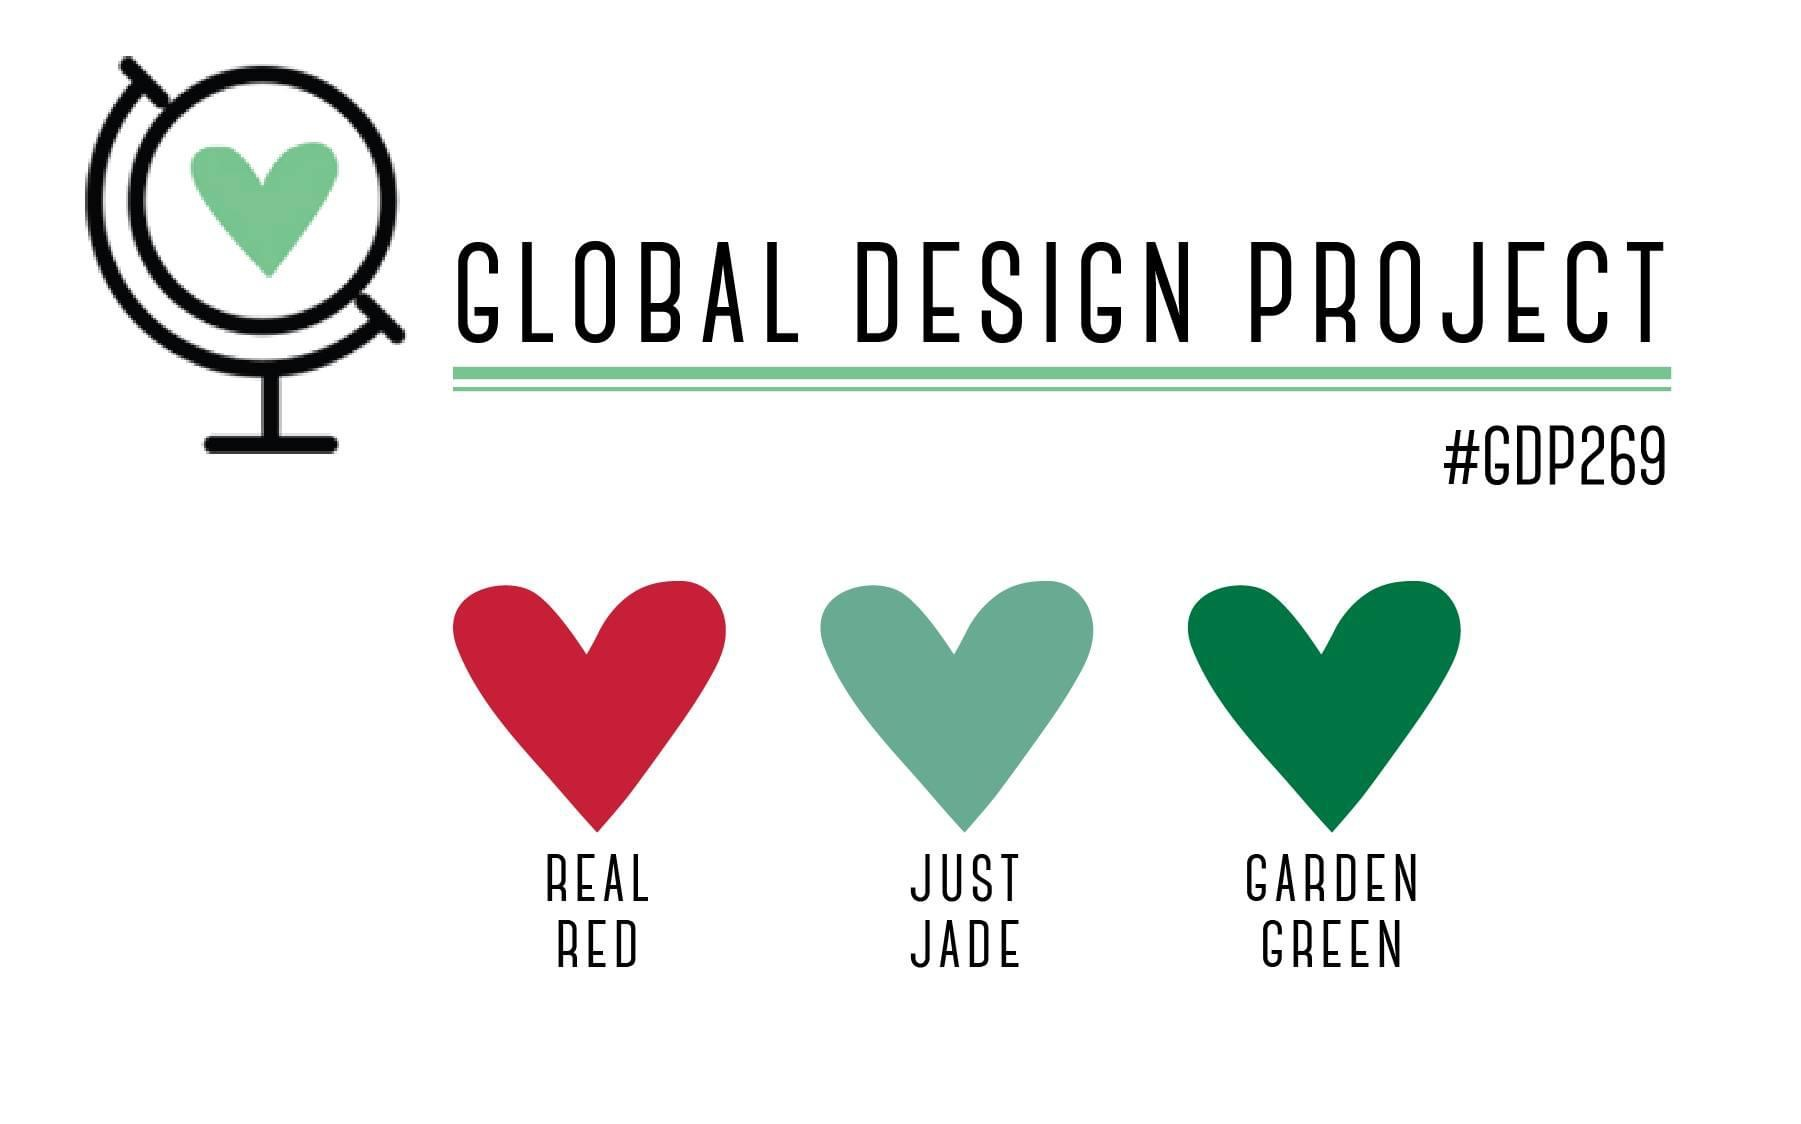 https://l.facebook.com/l.php?u=http%3A%2F%2Fwww.global-design-project.com%2F2020%2F11%2Fglobal-design-project-269-color.html%3Ffbclid%3DIwAR2CE_dv_5a7bdDmZPcHuva1KFthKZrC9w2divKSEZTSJ5EtrFdVeBX7iNI&h=AT3YD5VJjjRZhgxgwuLwKd75gnsIzDZmBdmtob53Qk2ekLry-05zQy8yayefUdh3QBtc1KZoHQ6ZL2OLubeYQlIK8C6soJJvmTYyRGv9qEbAQ2QJ7lIxqc50qQTBEu9L5D-sLyM&__tn__=R]-R&c[0]=AT35t5S-hQz1B-7PQbHOZOI0Wu3ErmwgHvhh_ctaJhvXEdgi-Y6GrcvofO-PoH8WX3uzhXbJVSpYCIsxNV0UKo8V34hFLINeYggryg-UAqH-1p1o_EW_sX3lmcxn2cMgiomwkRpXOEtVzg6cBIys4unbRd1iptY